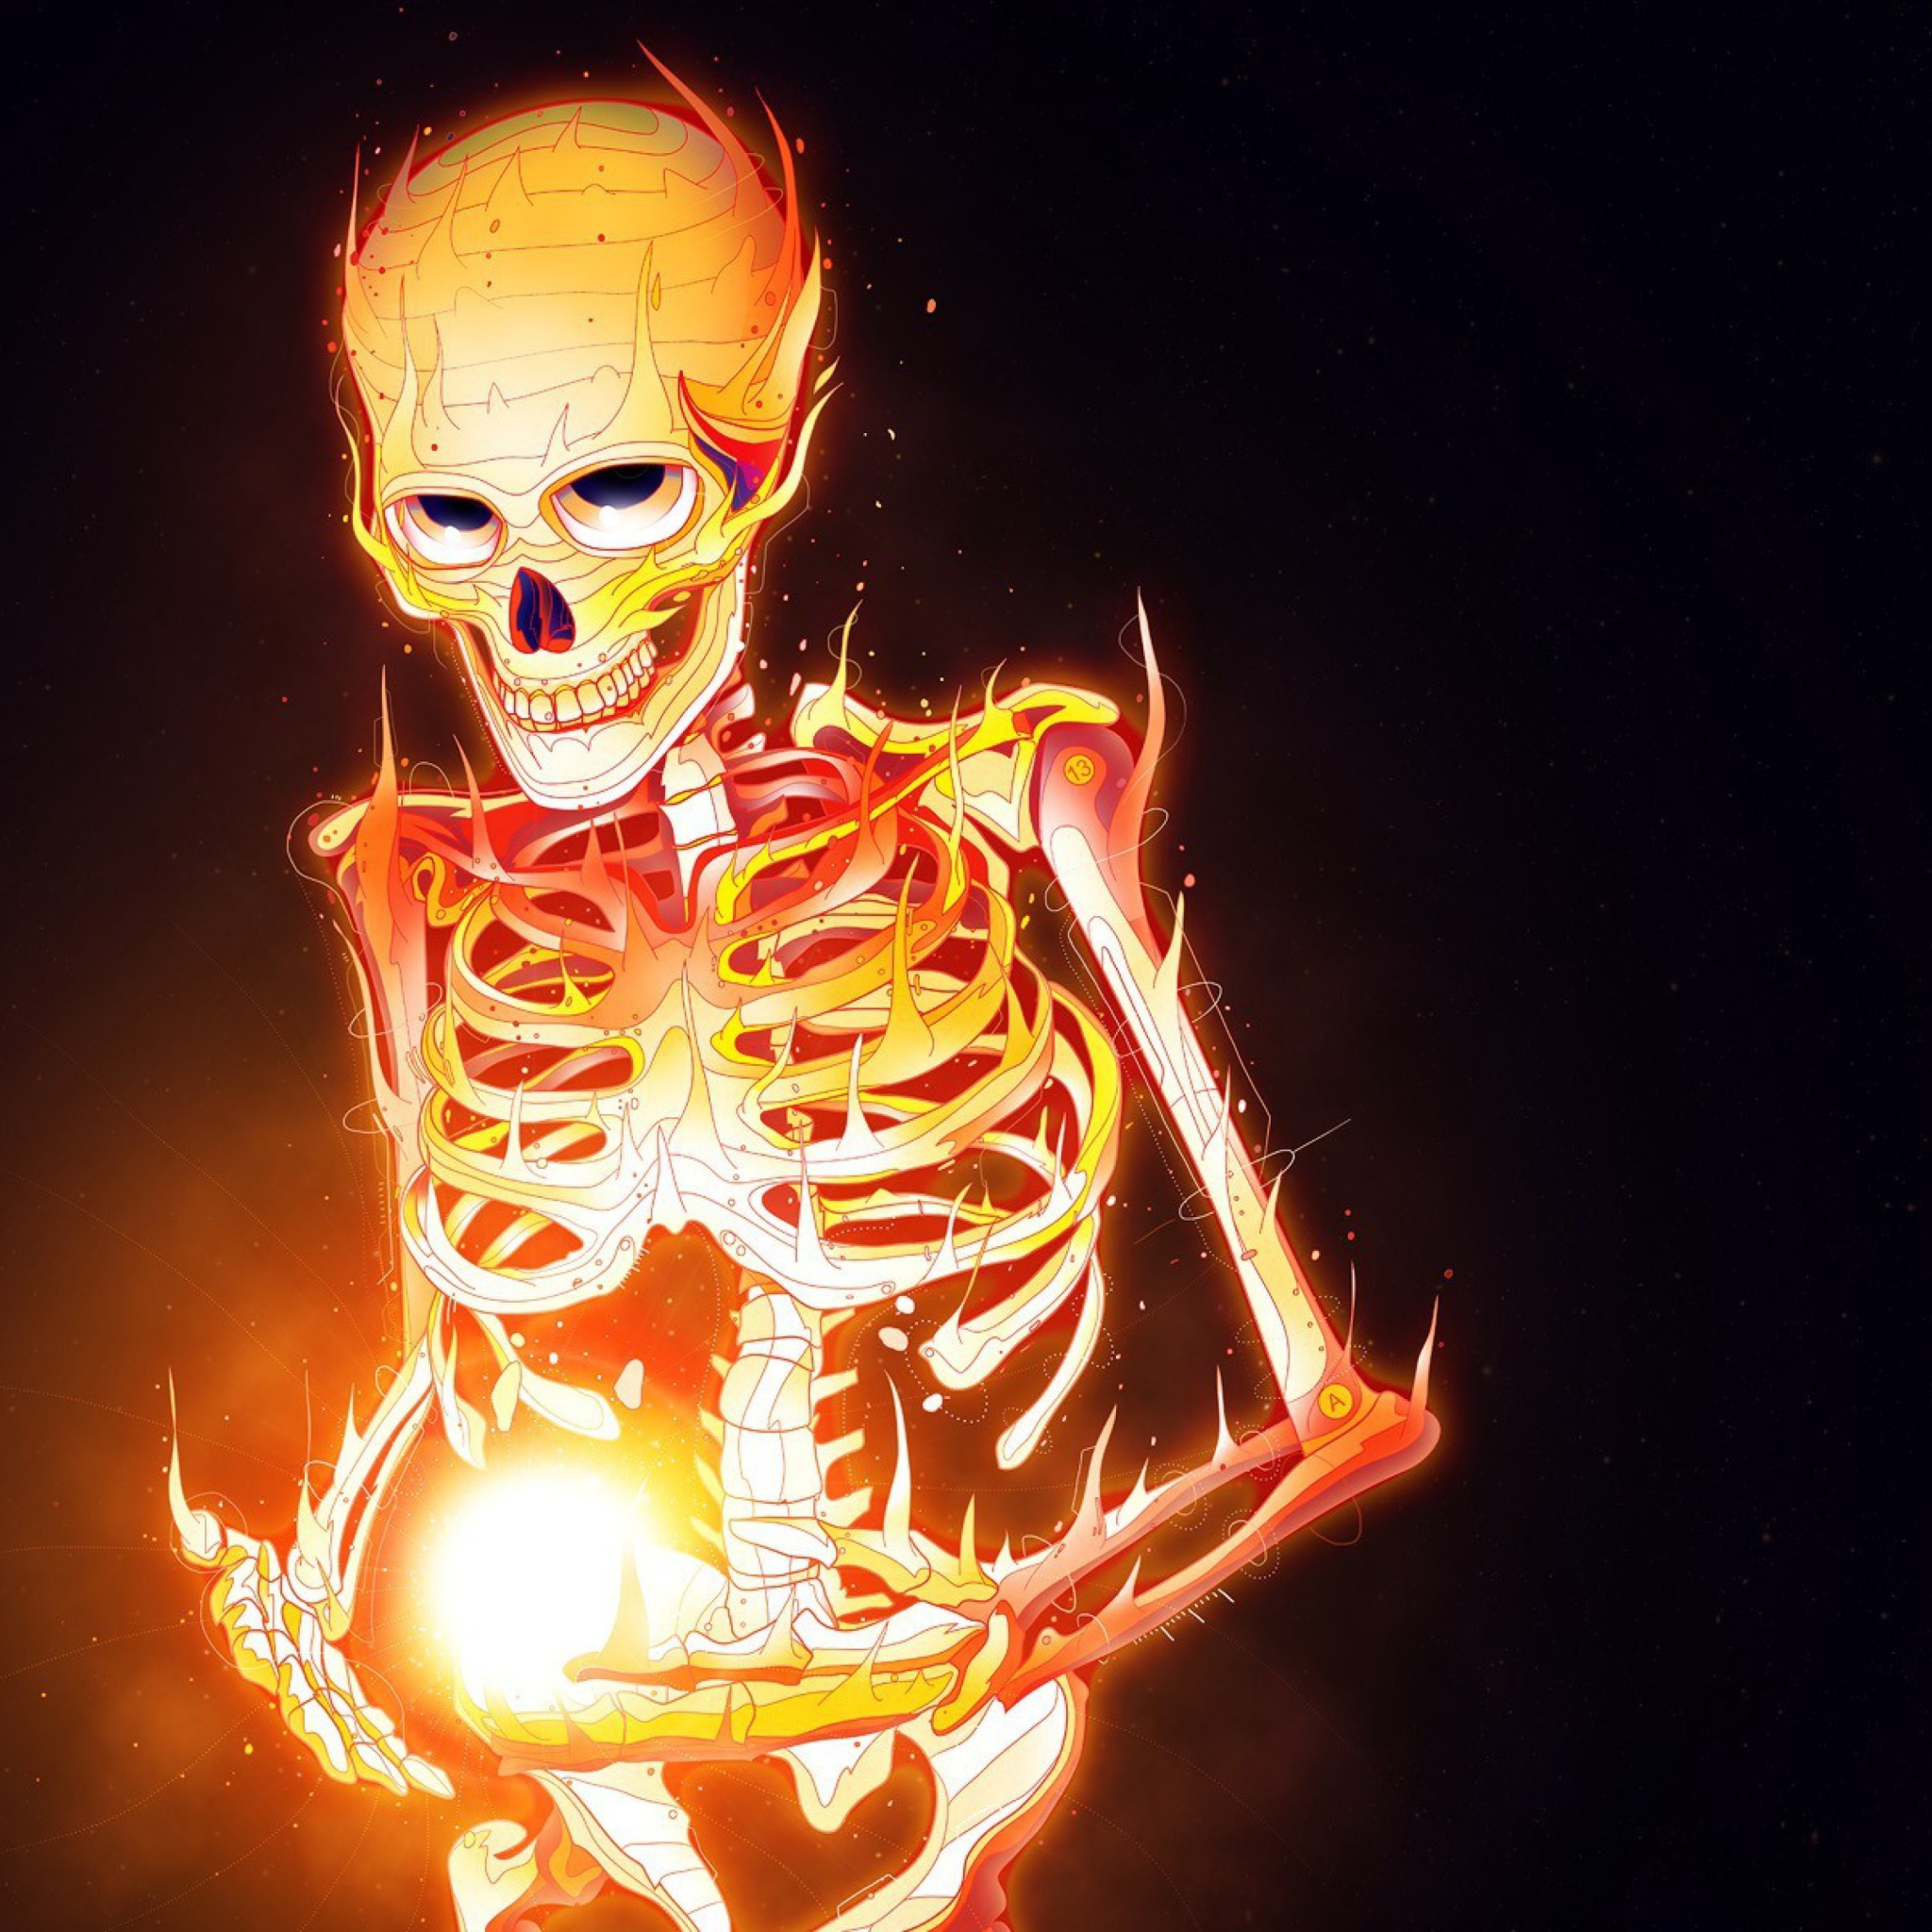 скелет  № 703136 бесплатно